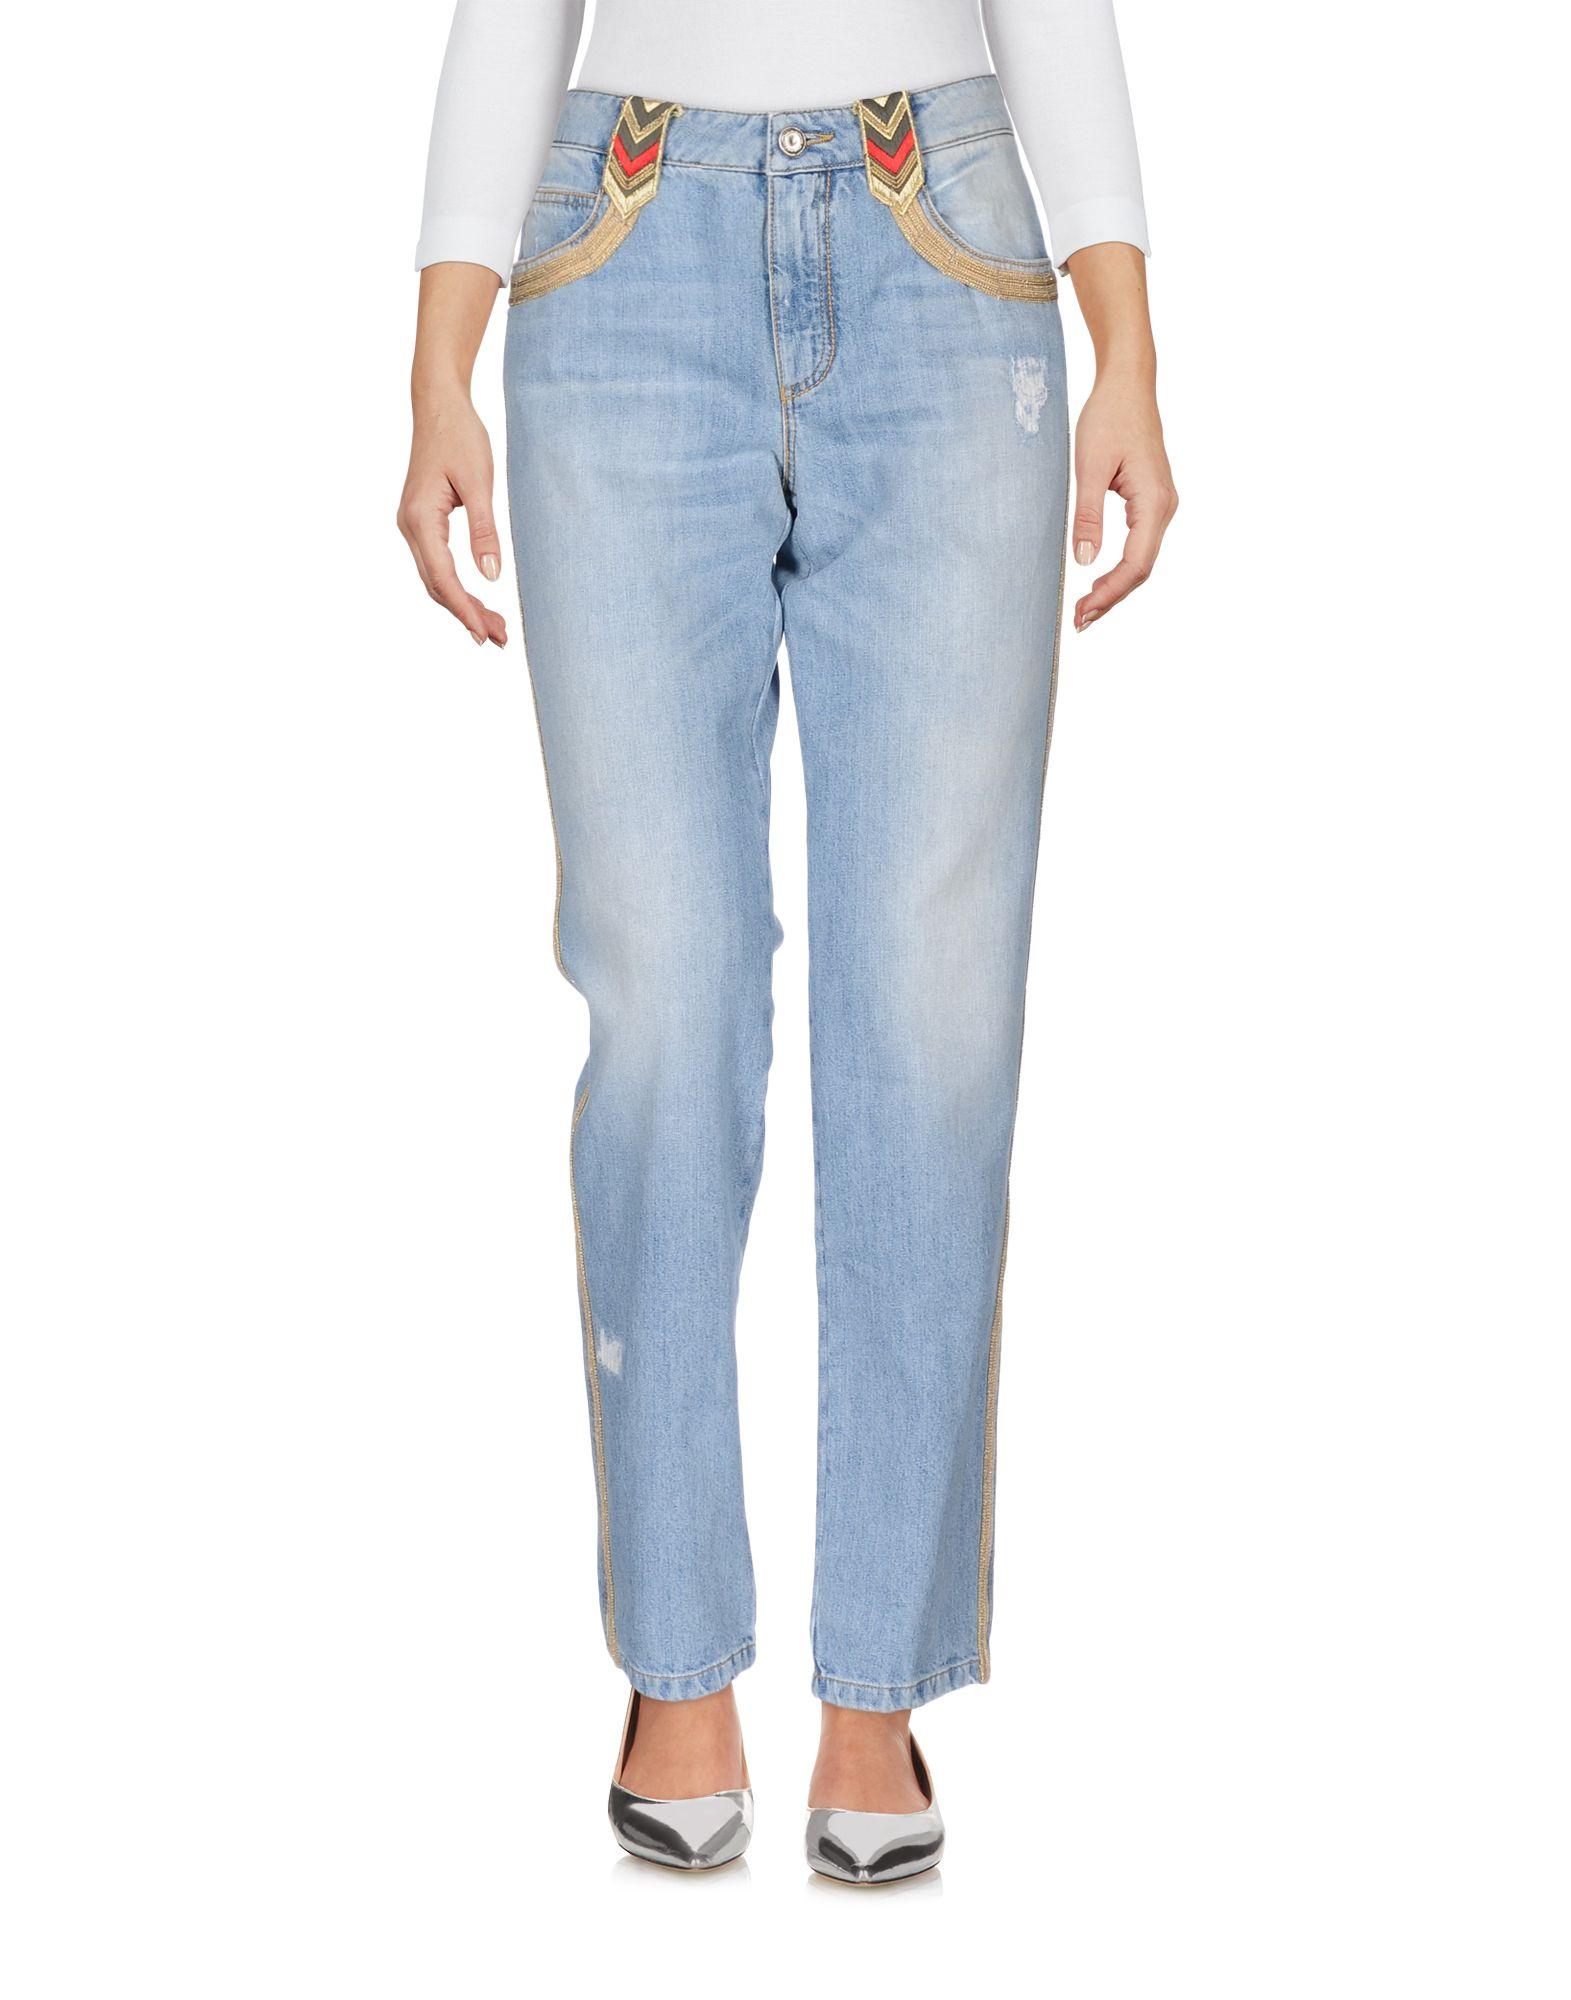 Pantaloni Jeans Jeans Ermanno Scervino donna - 42649754XI  ganz billig